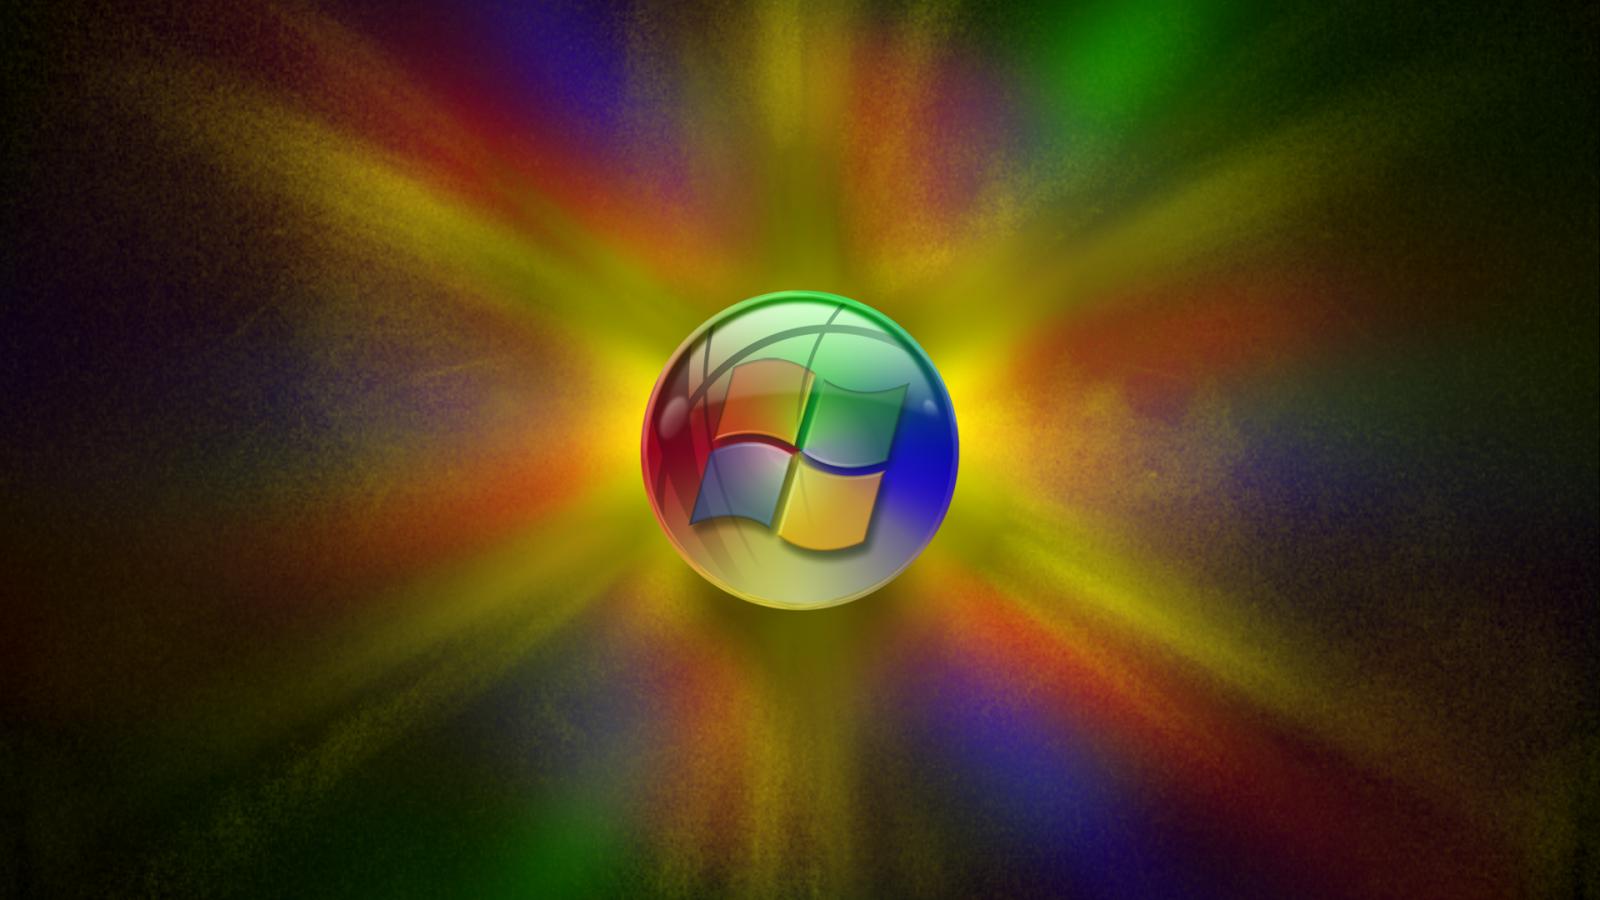 Custom Windows 7 Wallpapers [continued]   Page 71   Windows 7 Help 1600x900